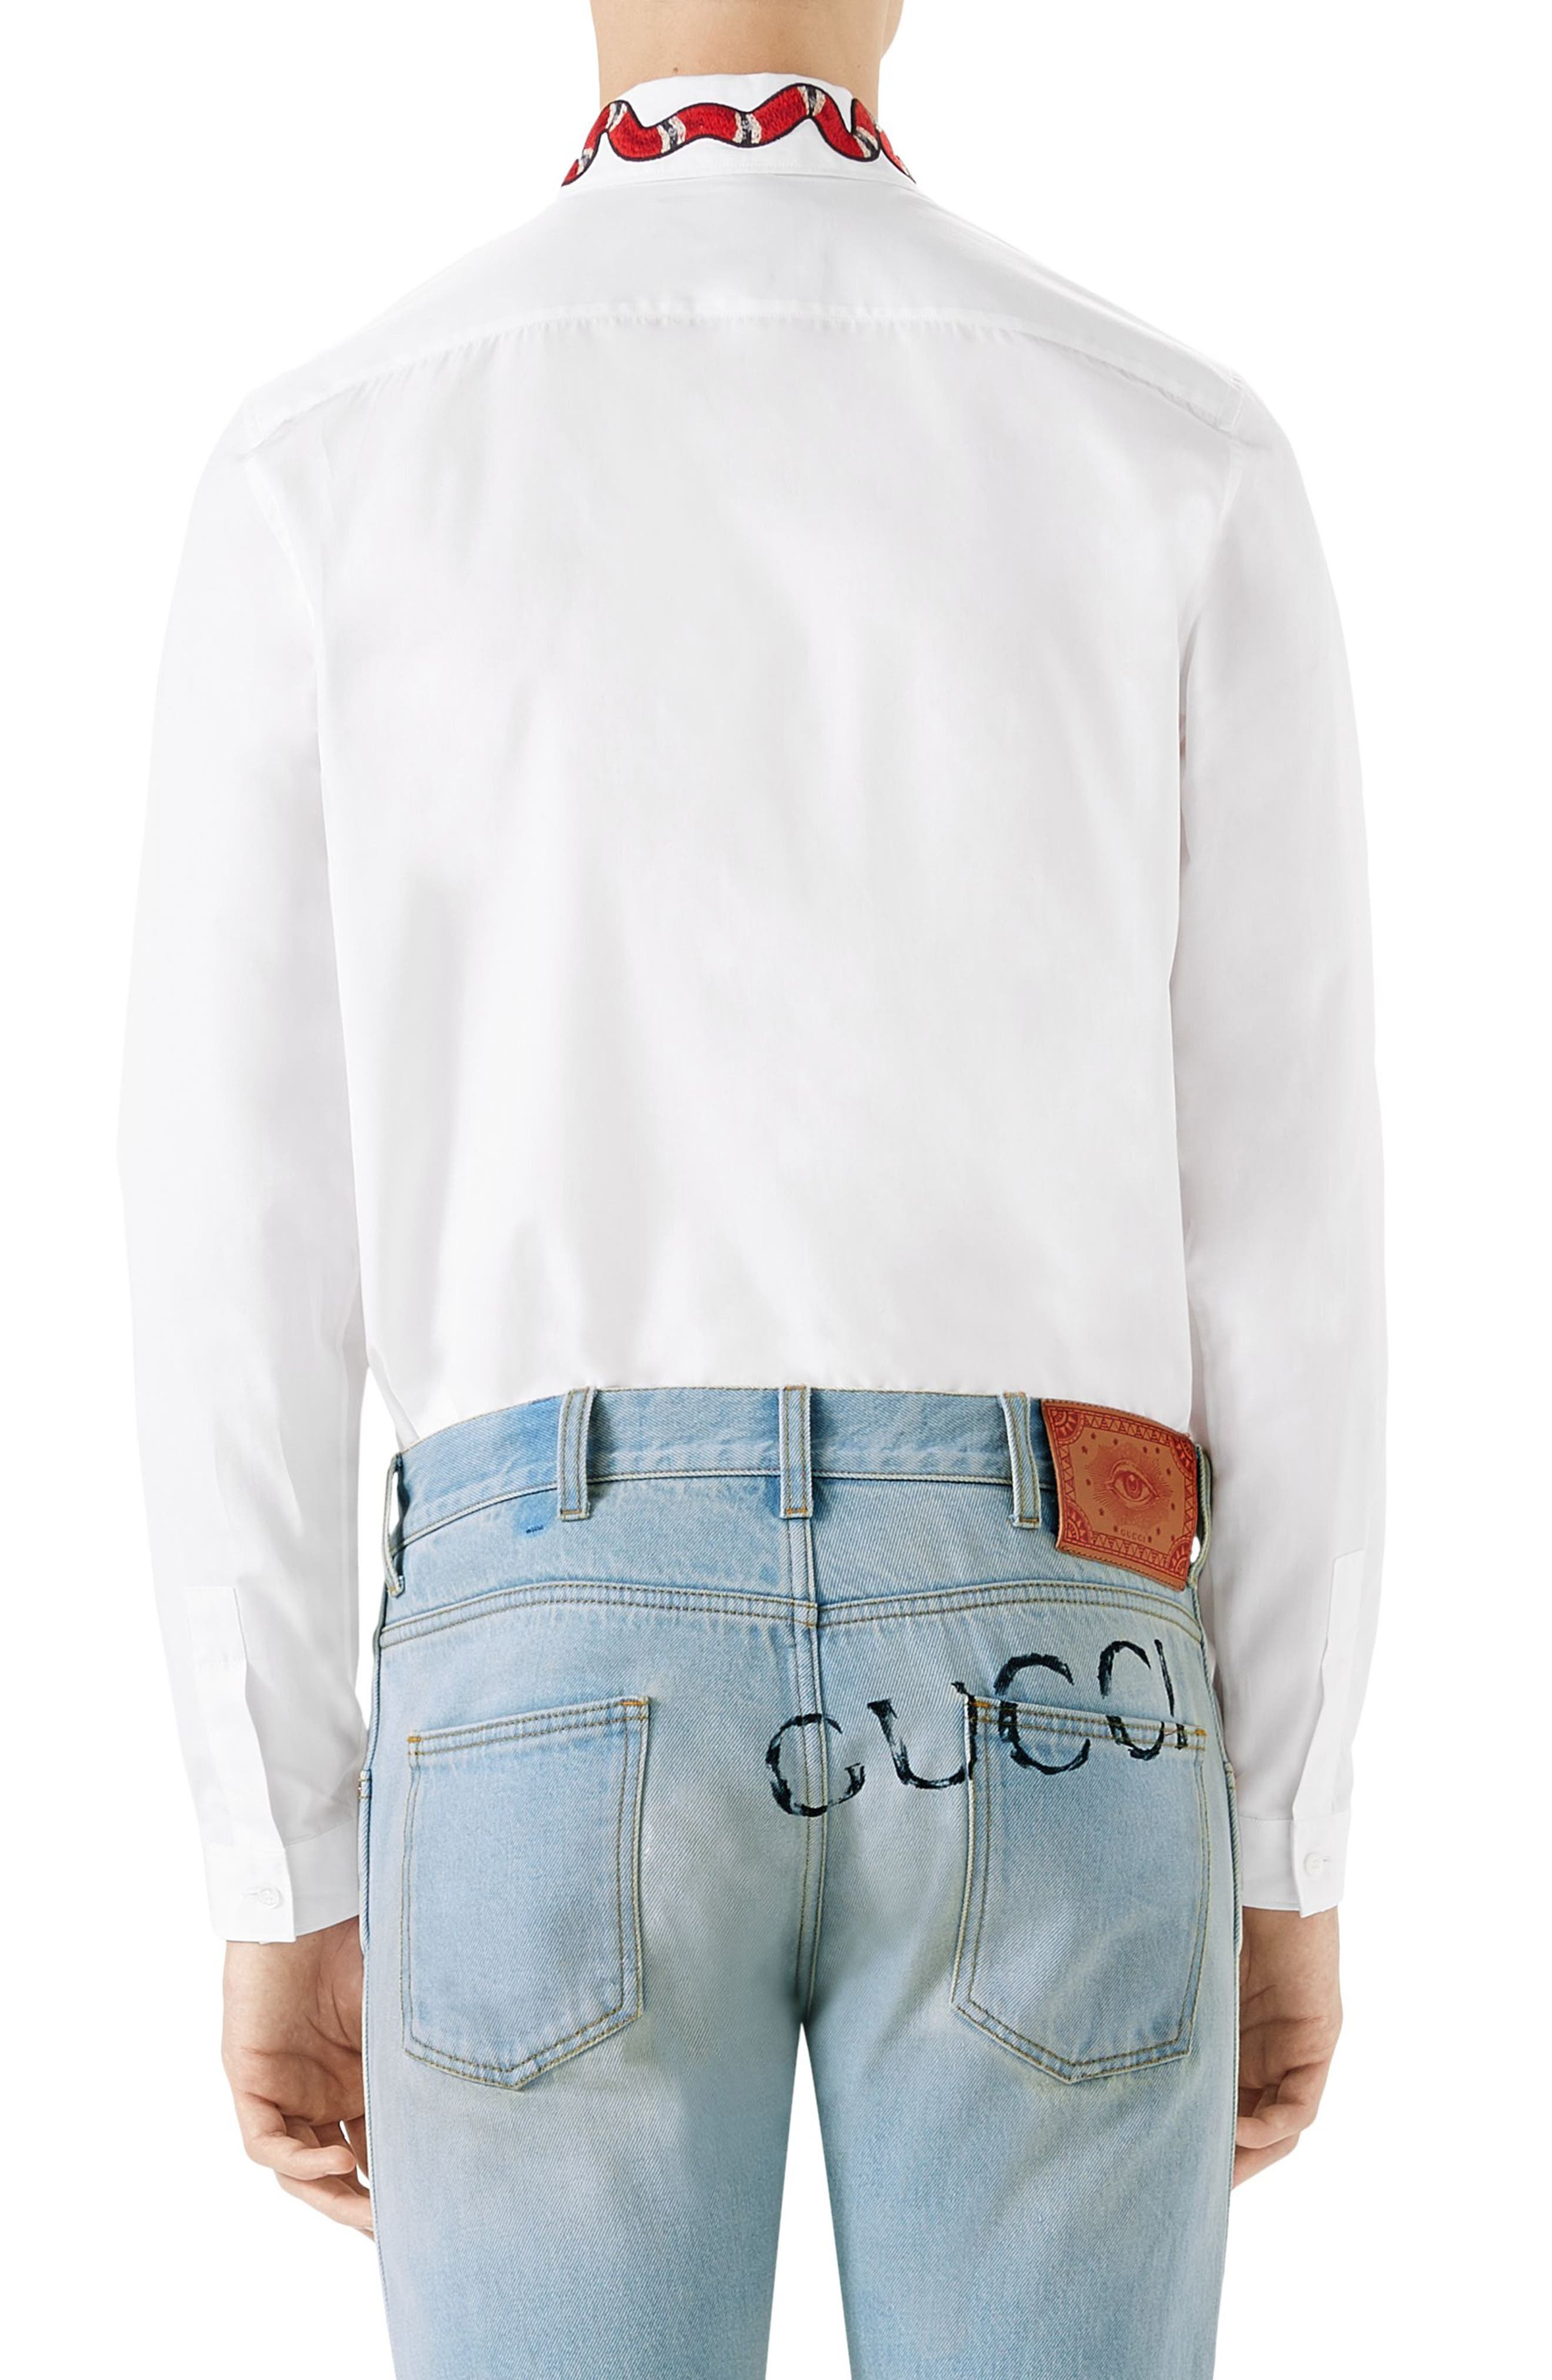 Snake Embroidered Collar Shirt,                             Alternate thumbnail 2, color,                             White